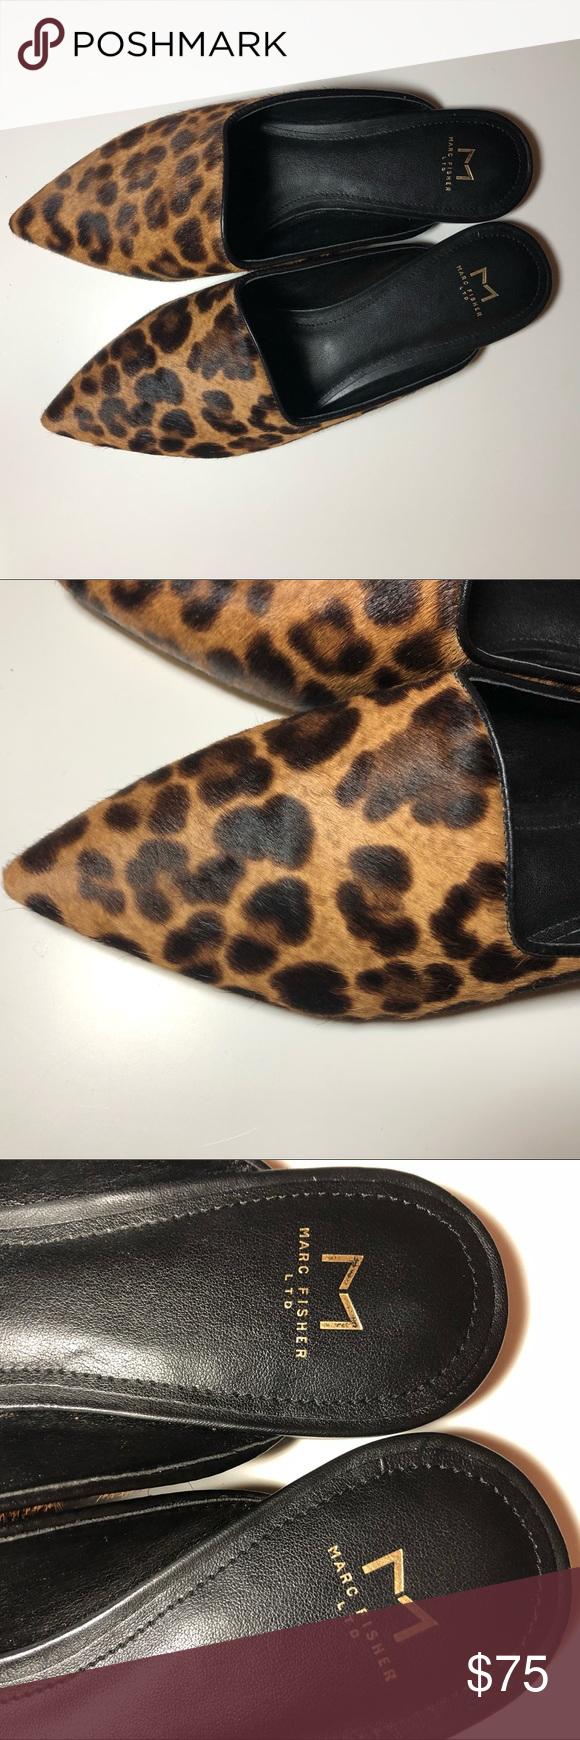 Marc Fisher Leopard Print Mules Size 7M